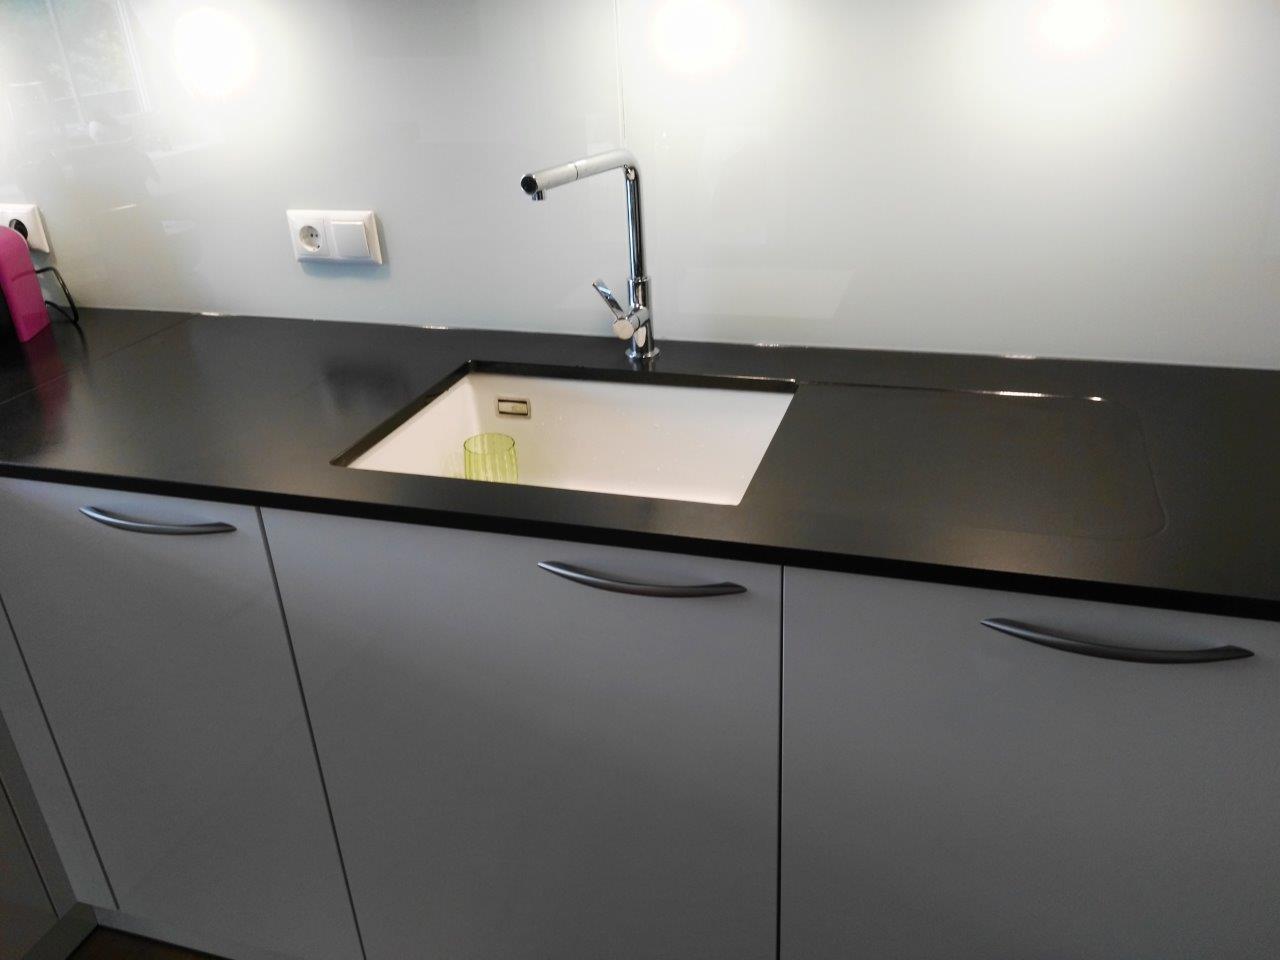 steinplatte kche interesting full size of kuche orange. Black Bedroom Furniture Sets. Home Design Ideas